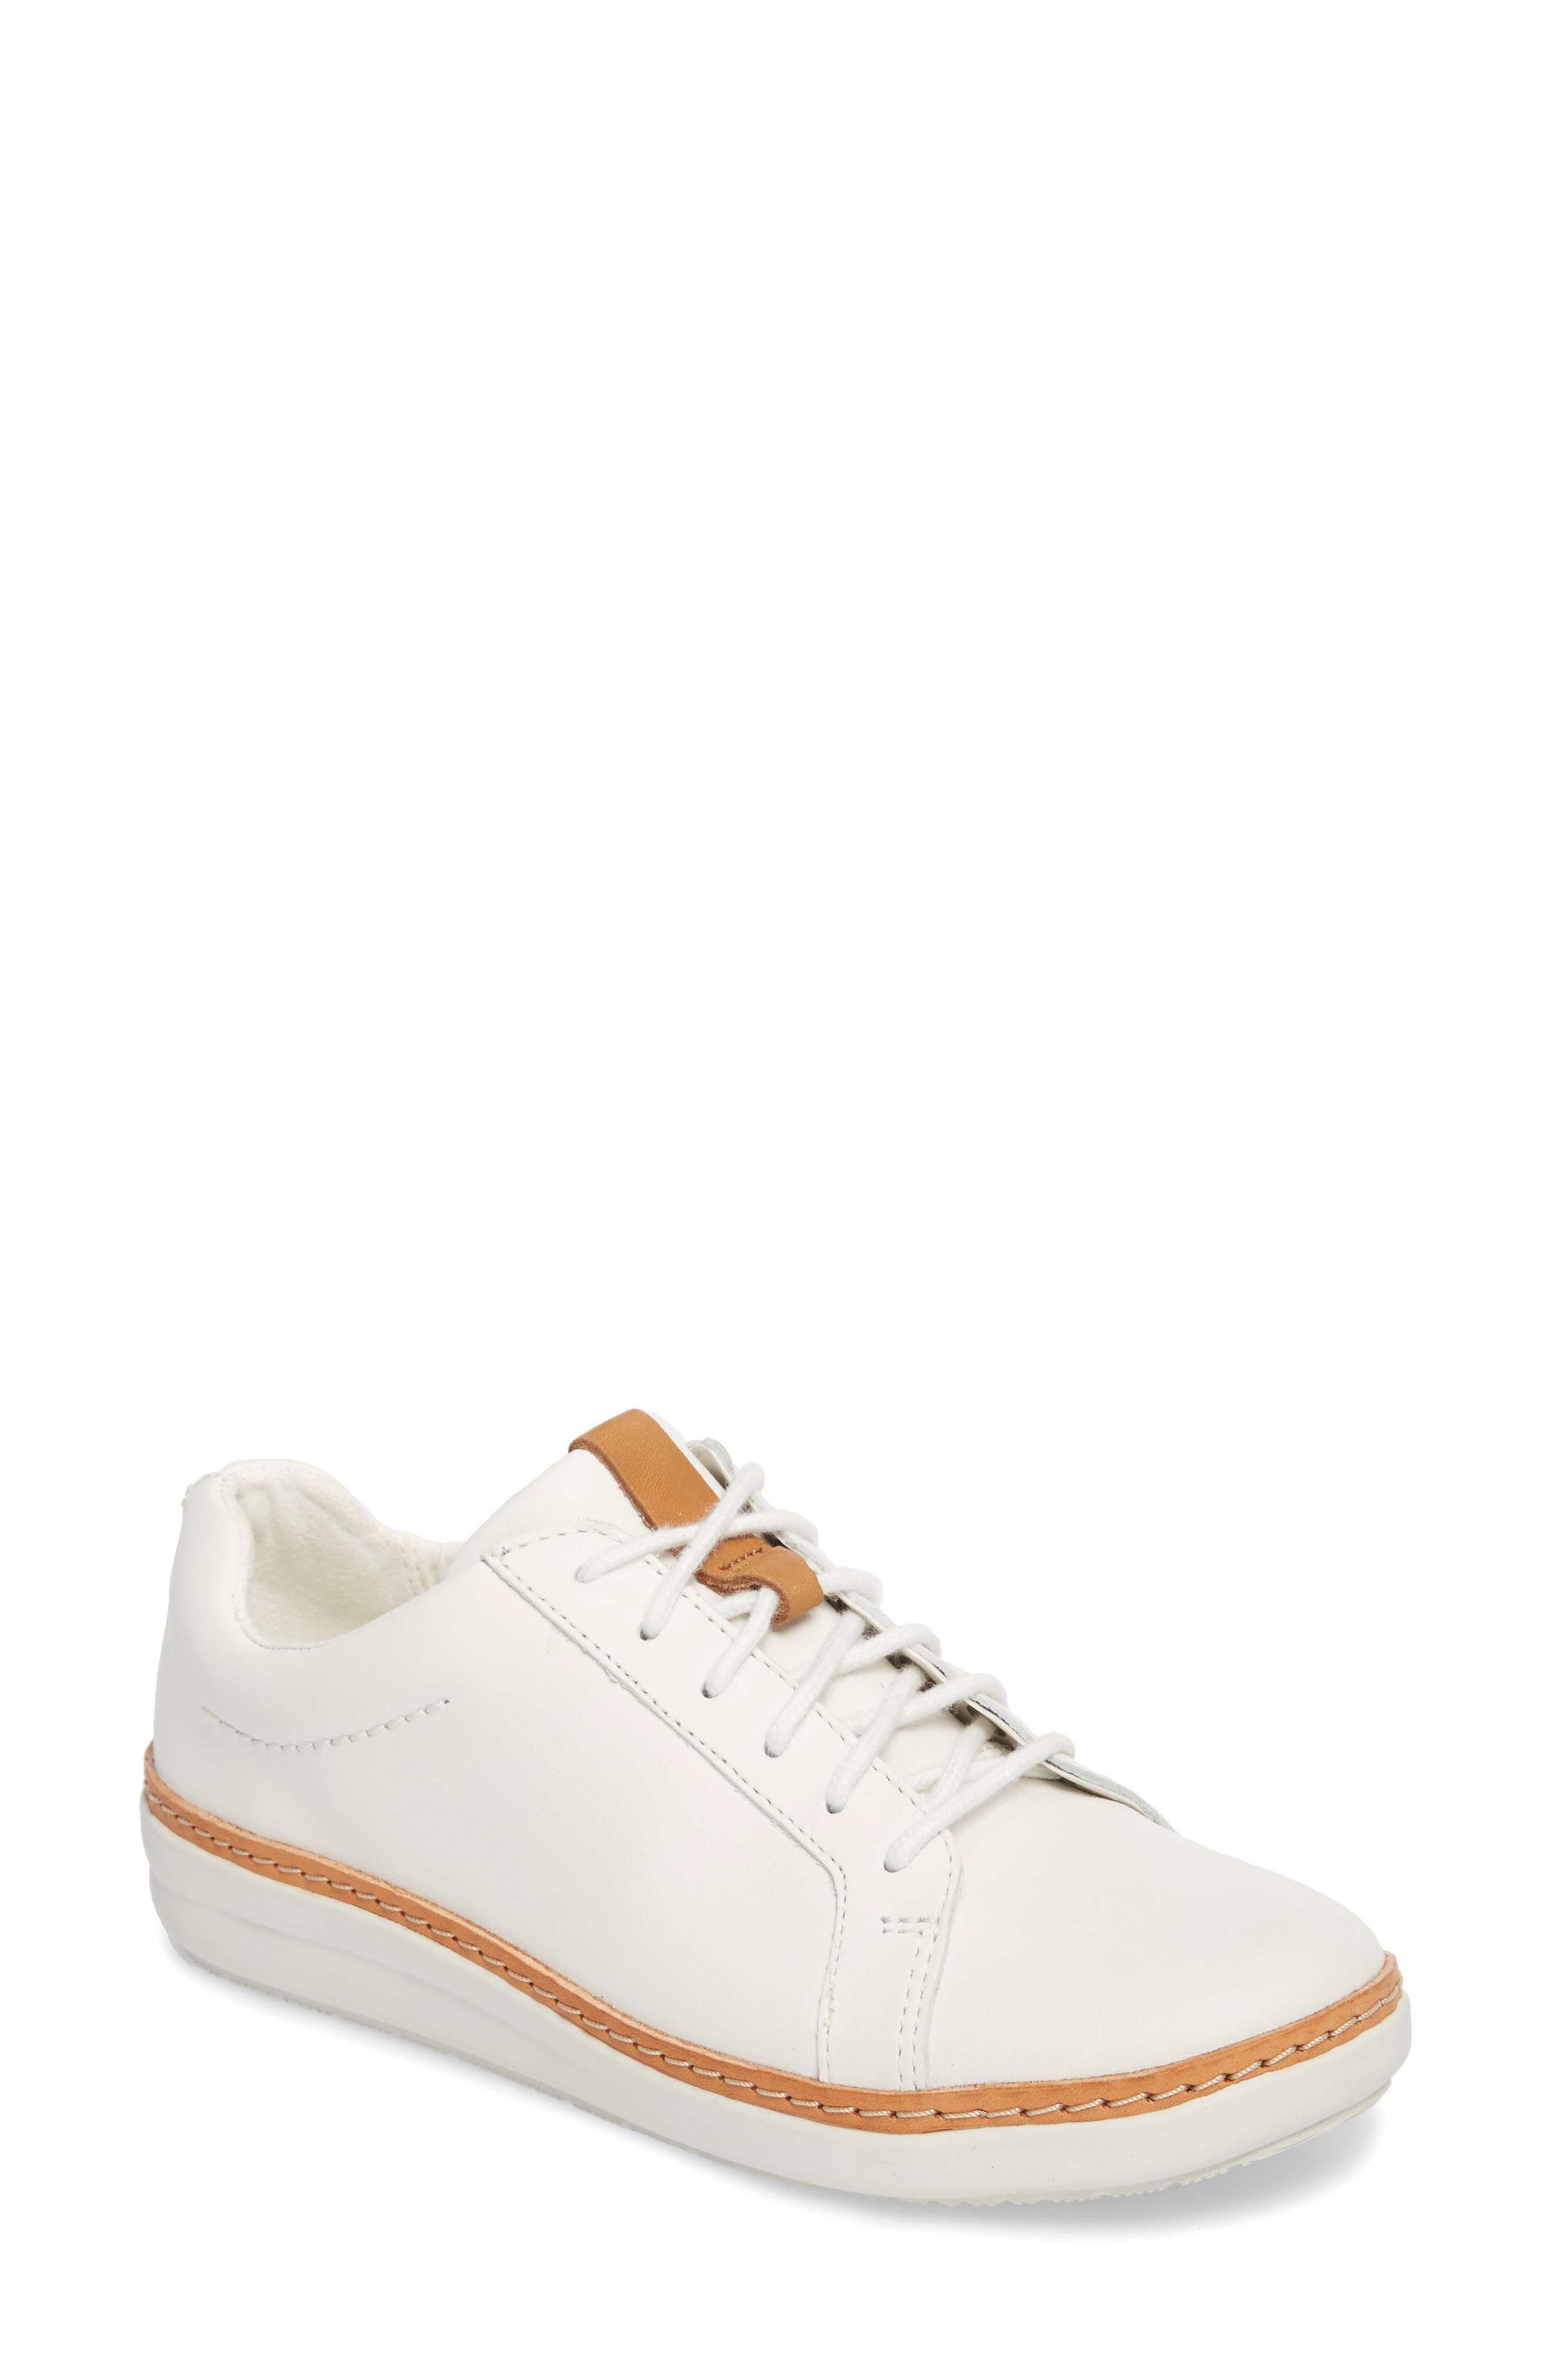 Alternate Image 1 Selected - Clarks® Amberlee Rosa Sneaker (Women)